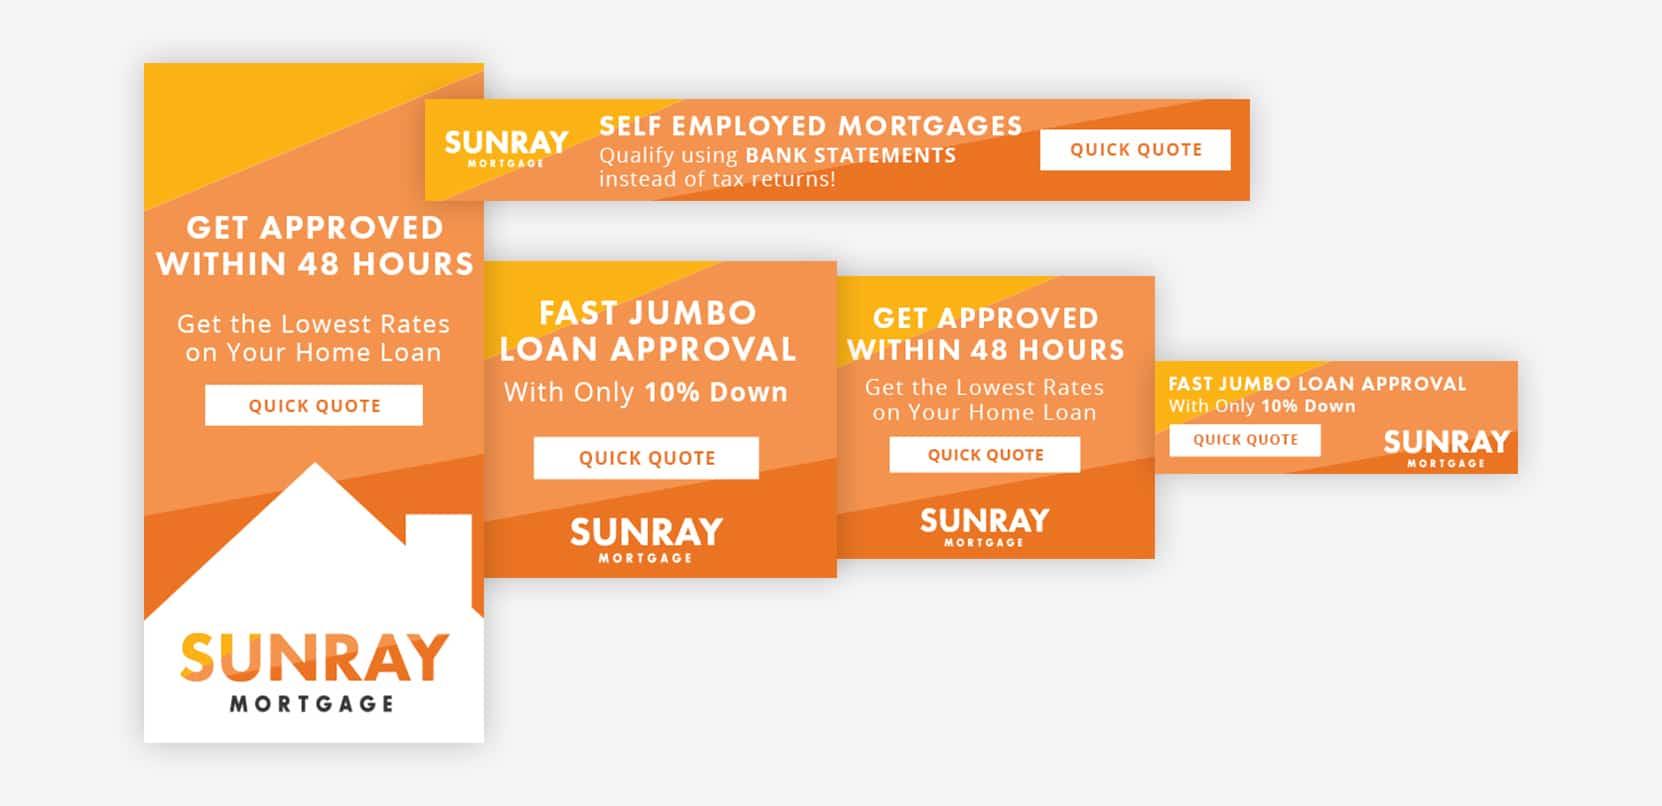 Sunray Ads Display